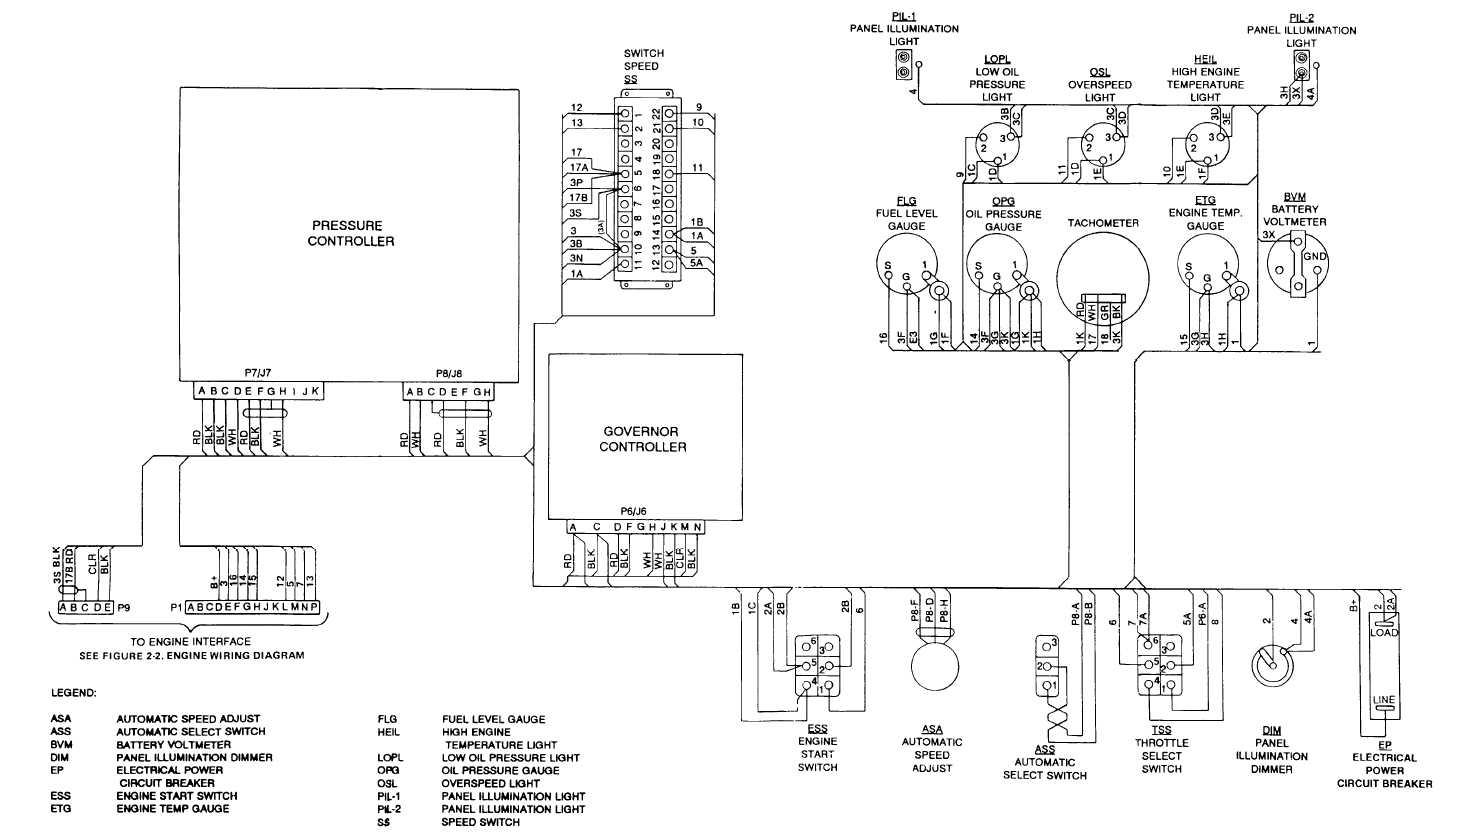 Astonishing Wiring Diagram Moreover Amf Panel Wiring Diagram On Wiring Diagram Wiring Digital Resources Talizslowmaporg